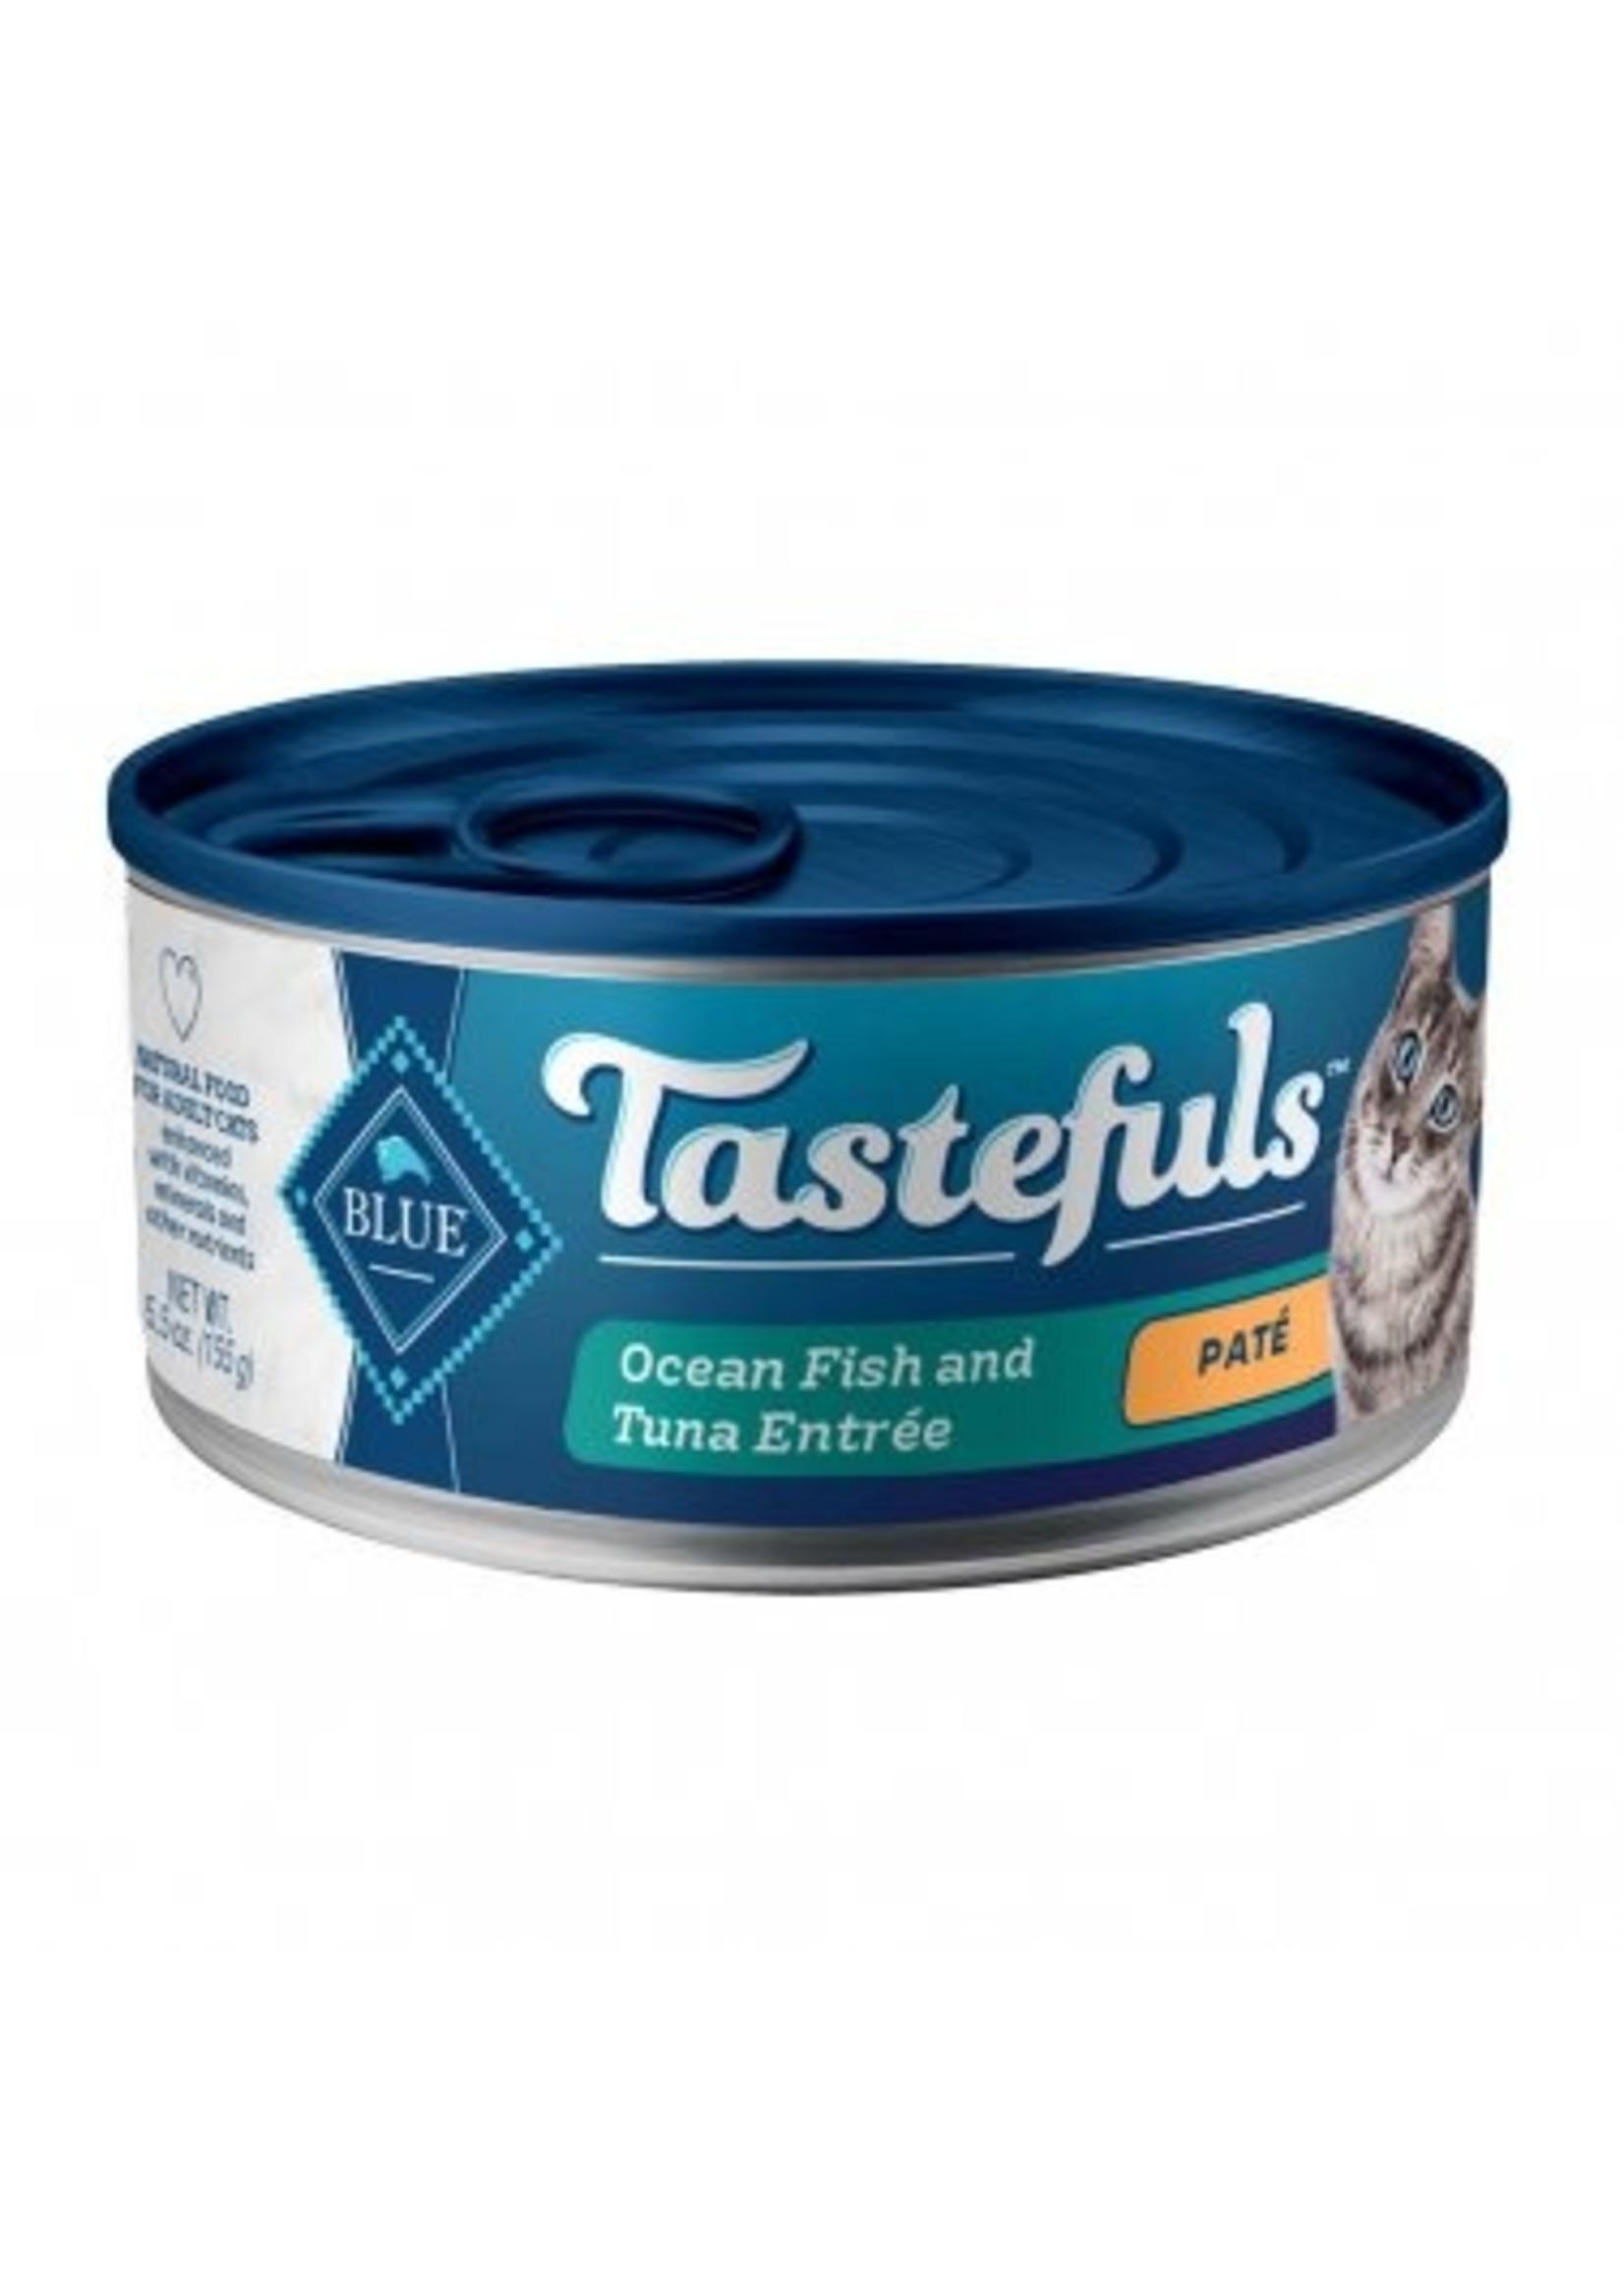 Blue Buffalo Blue Buffalo Tastefuls Ocean Fish & Tuna Cat Food 5.5 Oz